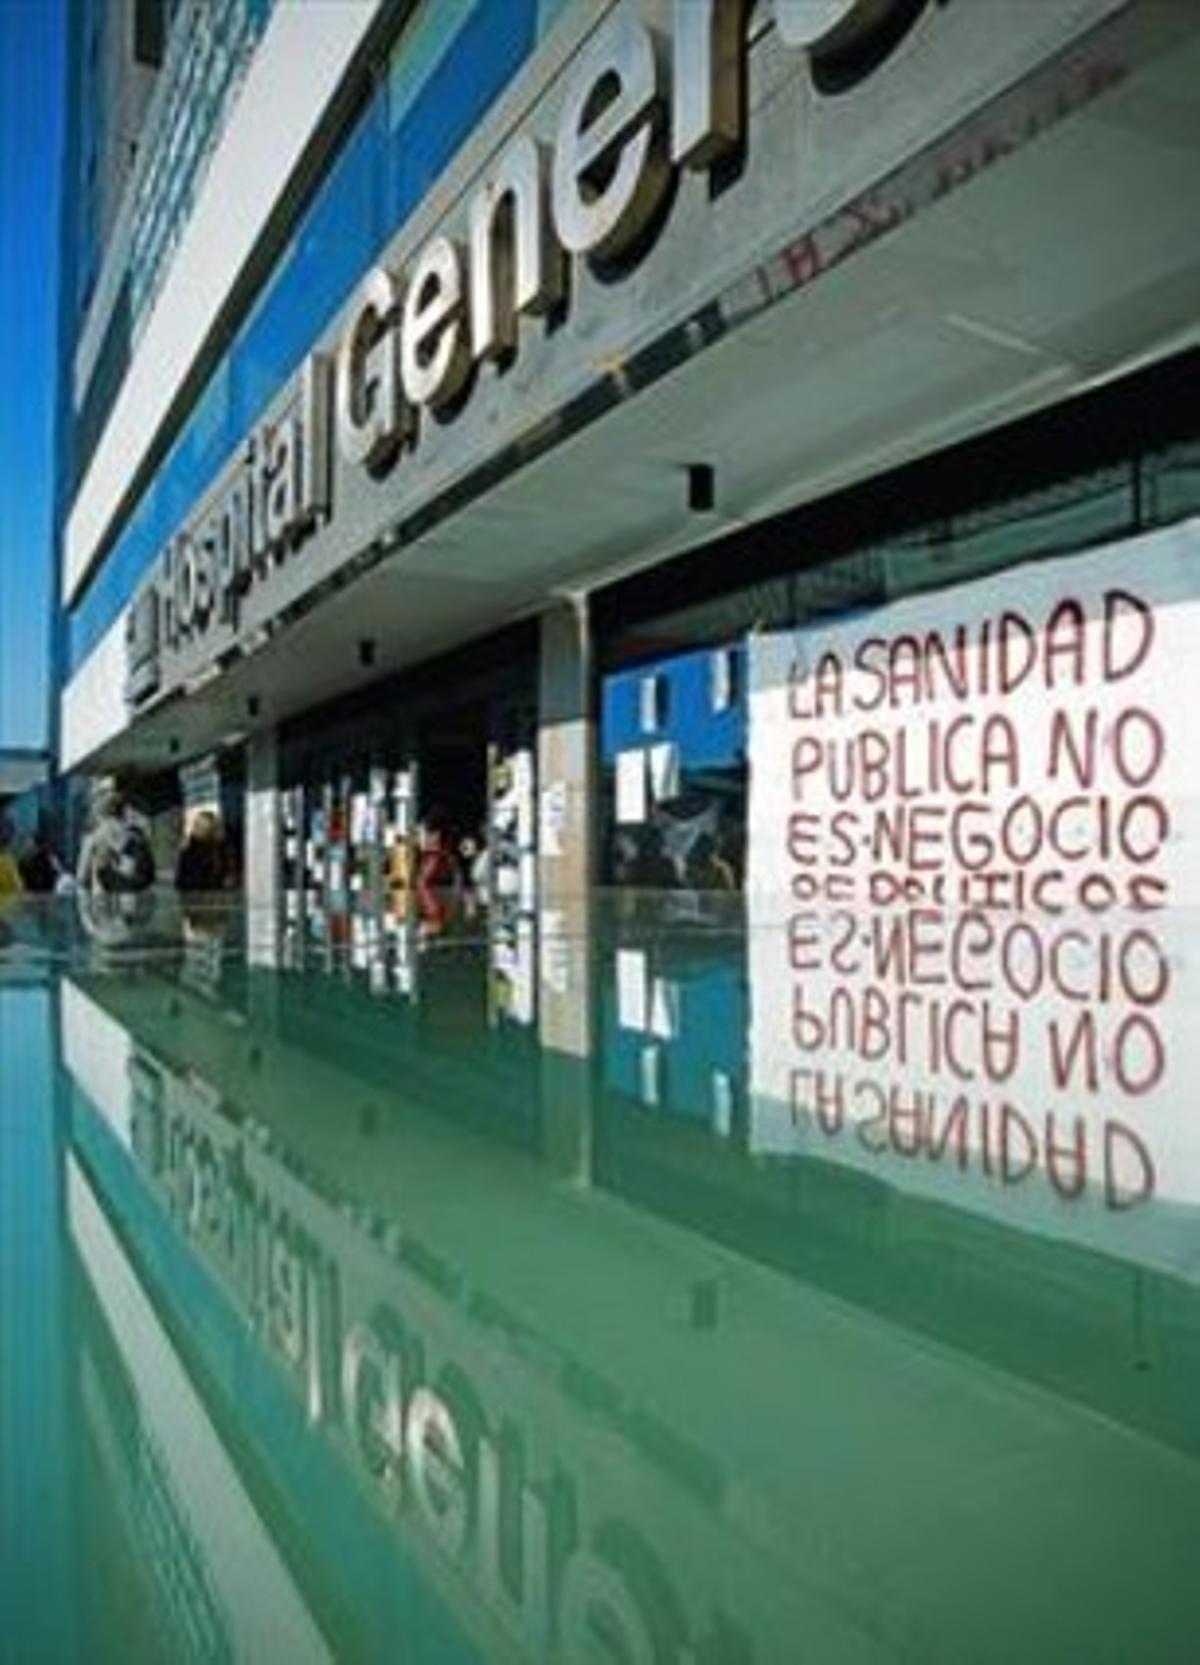 Pancarta a favor de la sanidad pública, en el Hospital General de Madrid.